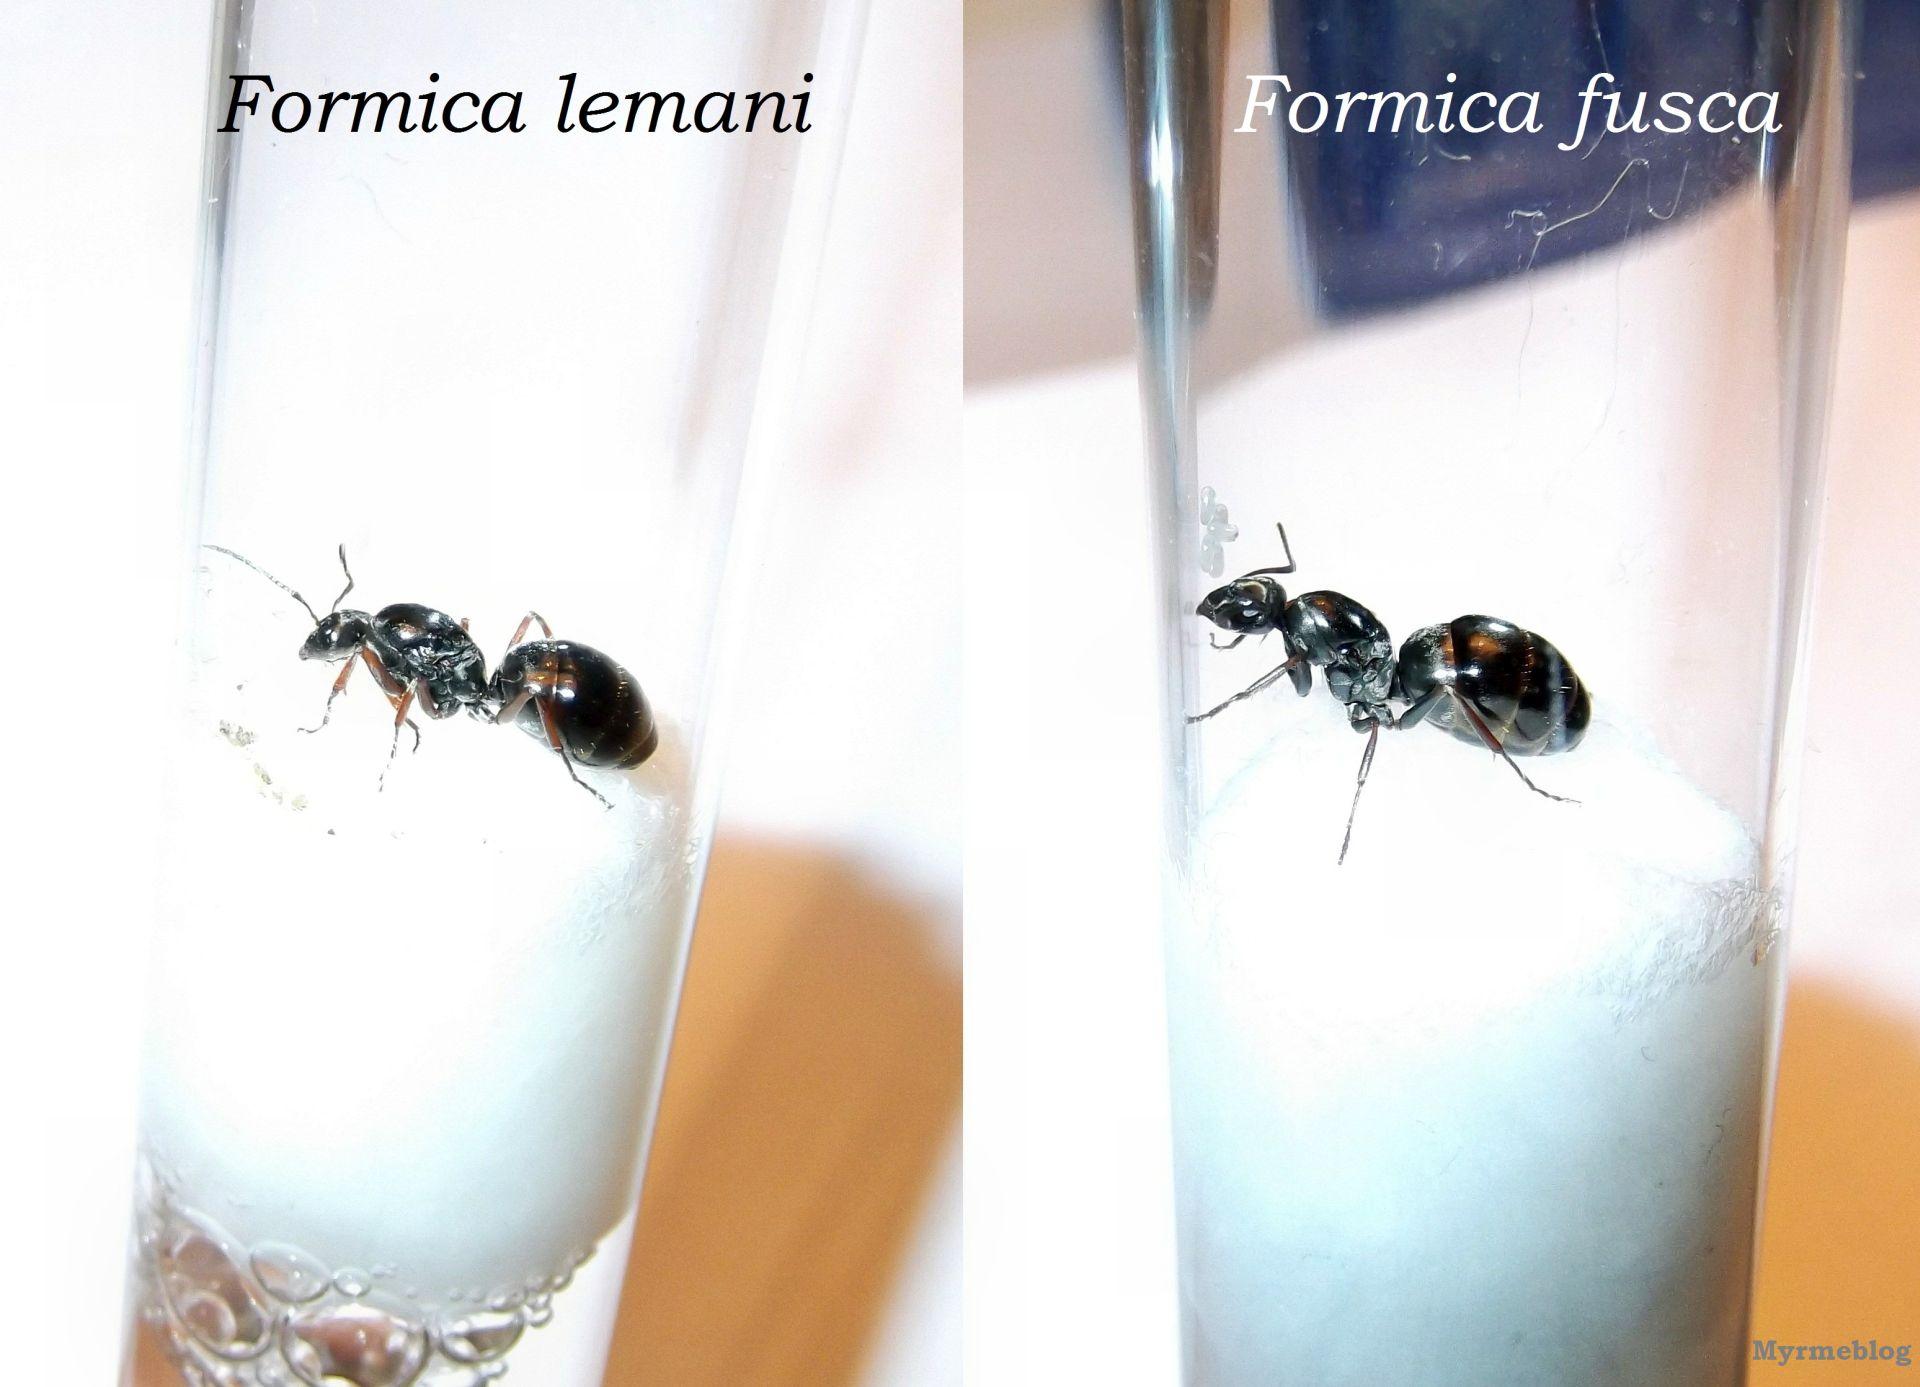 Porównanie Formica lemani i Formica fusca